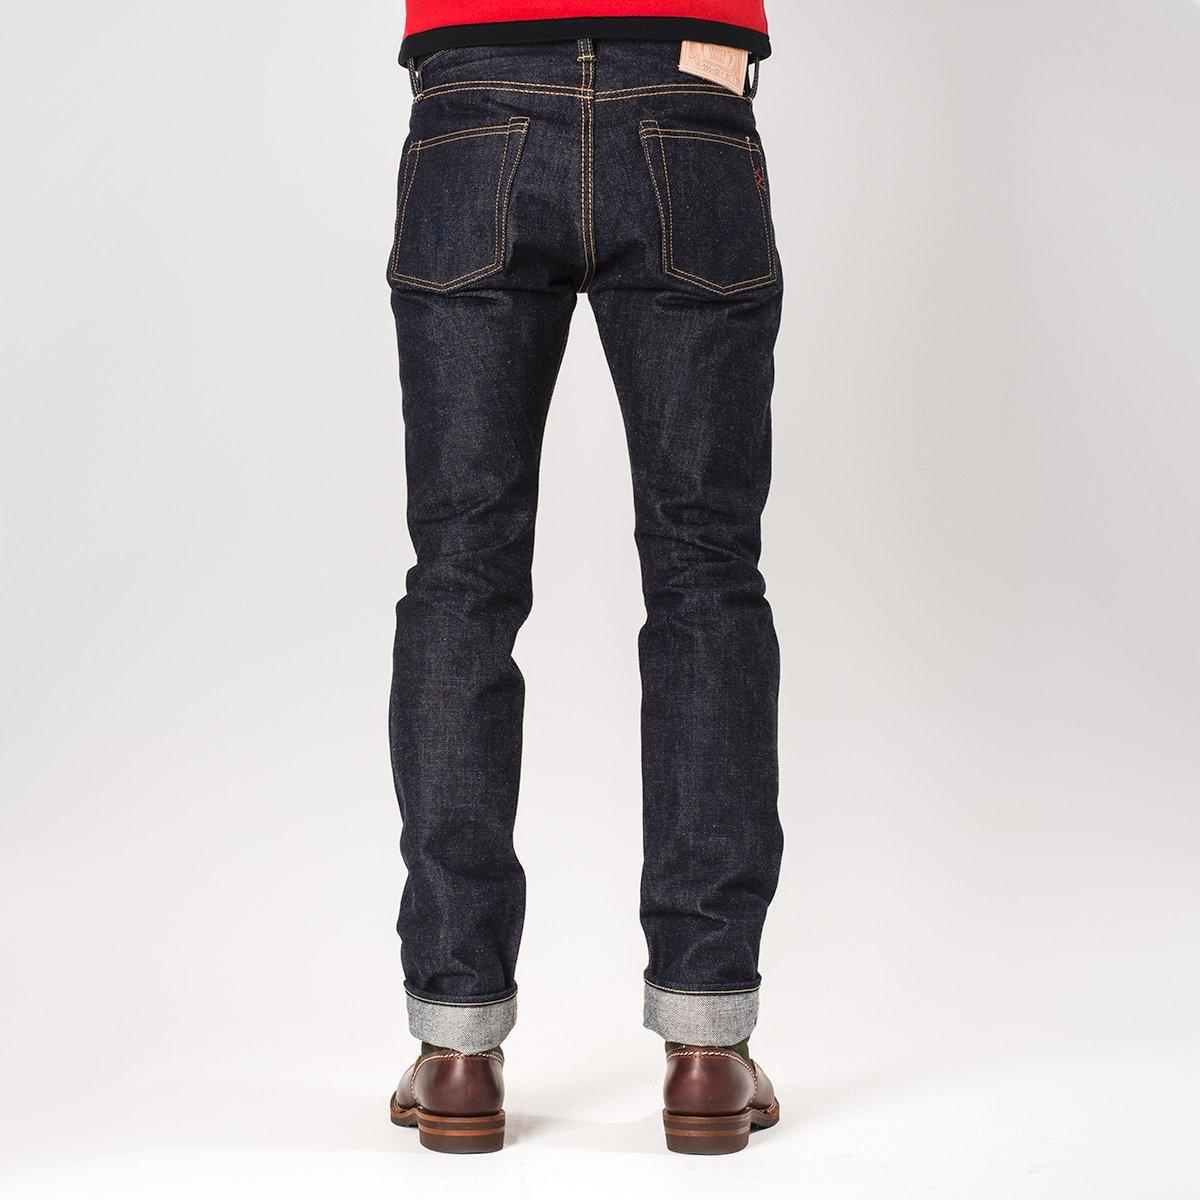 fdc45fd60ab Ih ironheart super duper slim oz raw indigo japanese jpg 1200x1200 Raw  selvedge jeans